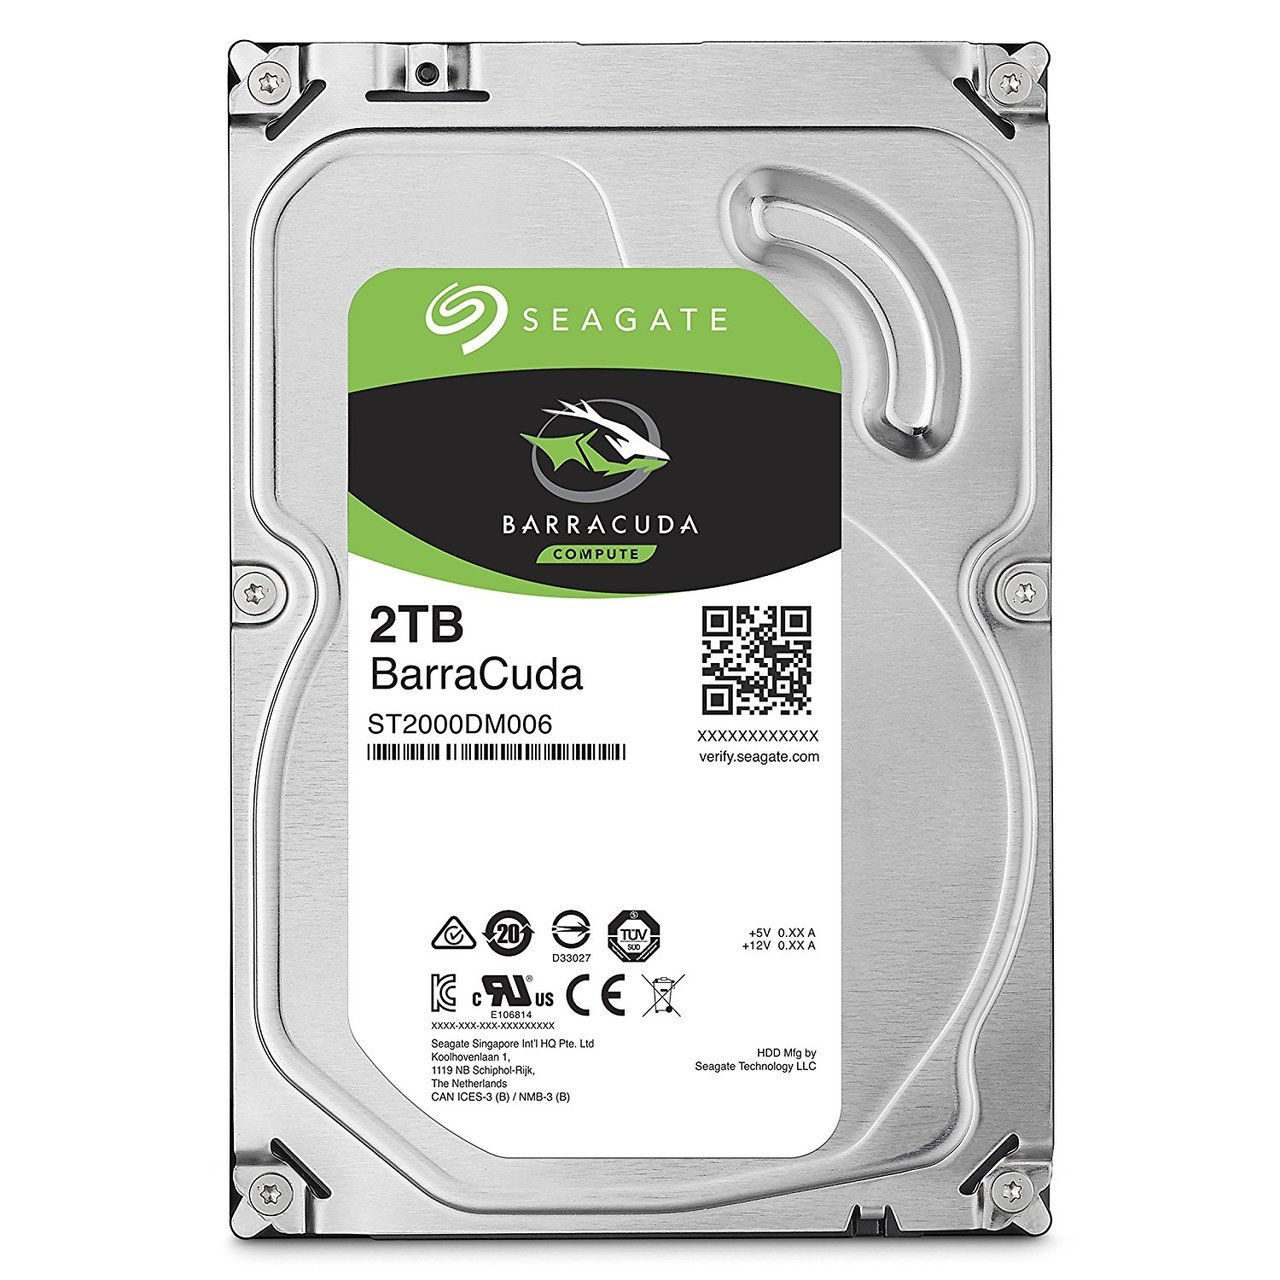 Seagate 2TB BarraCuda SATA 6 Gb/s 7200 RPM 64MB Cache 3.5 Inch Desktop Hard Drive